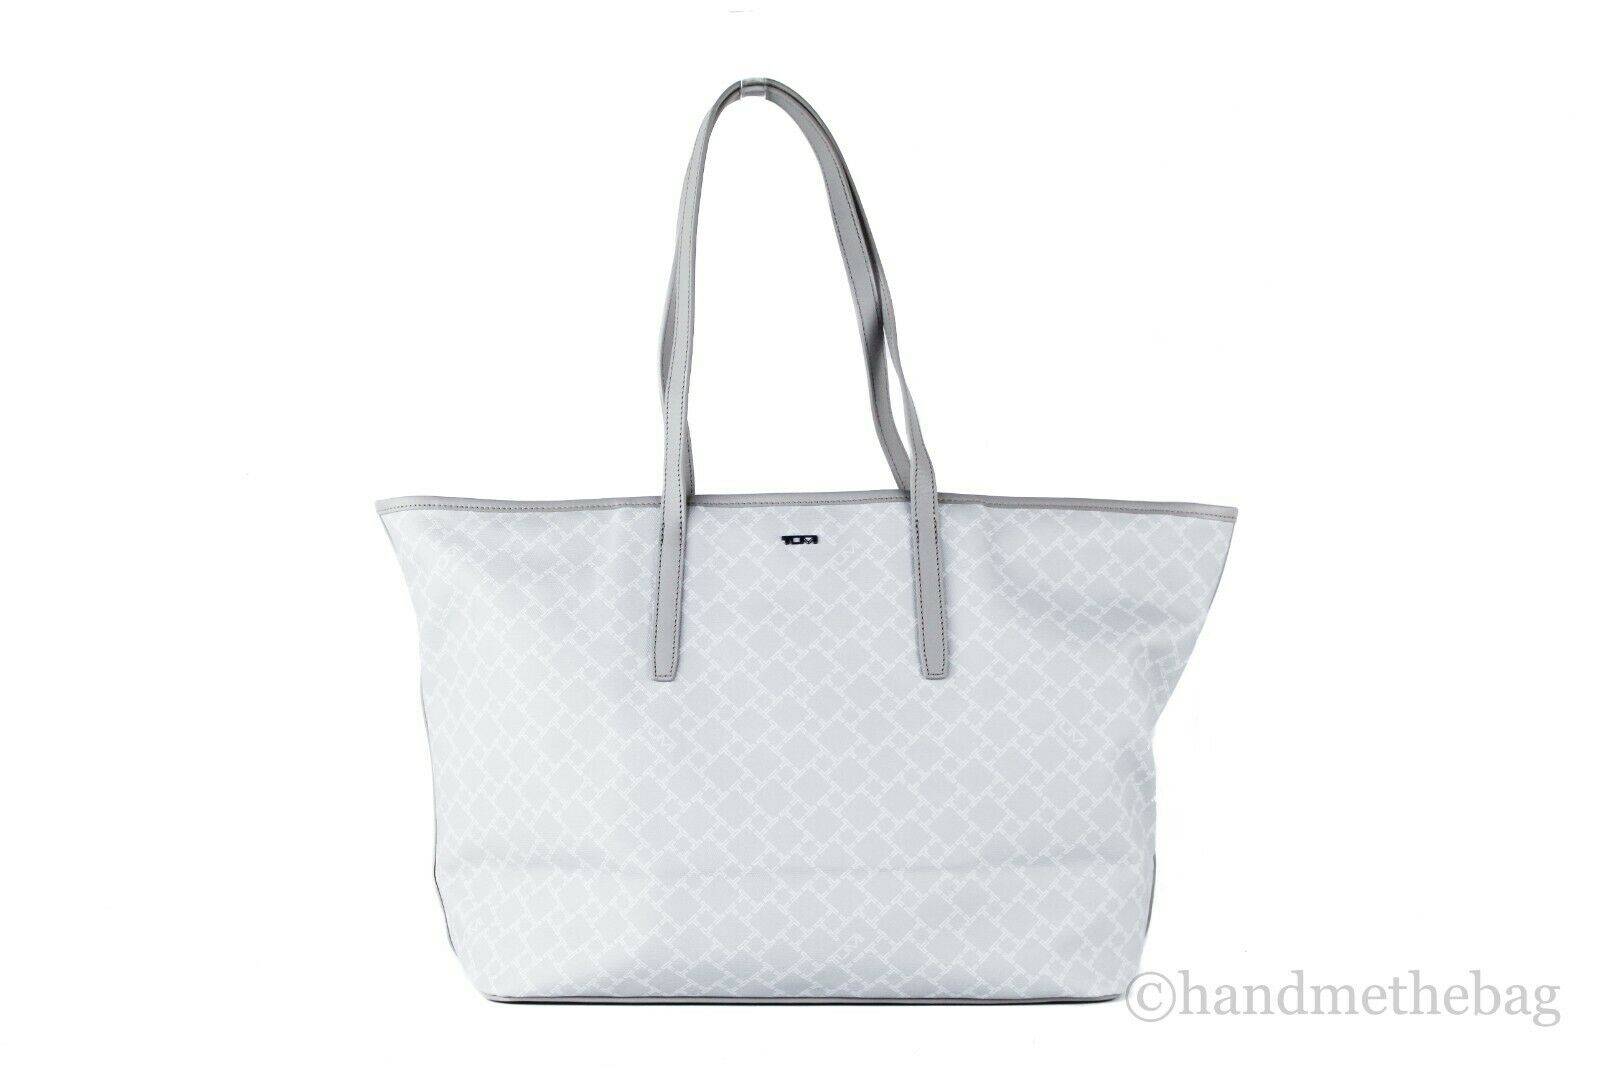 Tumi Everyday Large Coated Canvas Leather Shoulder Tote Bag Carryall Handbag Gray